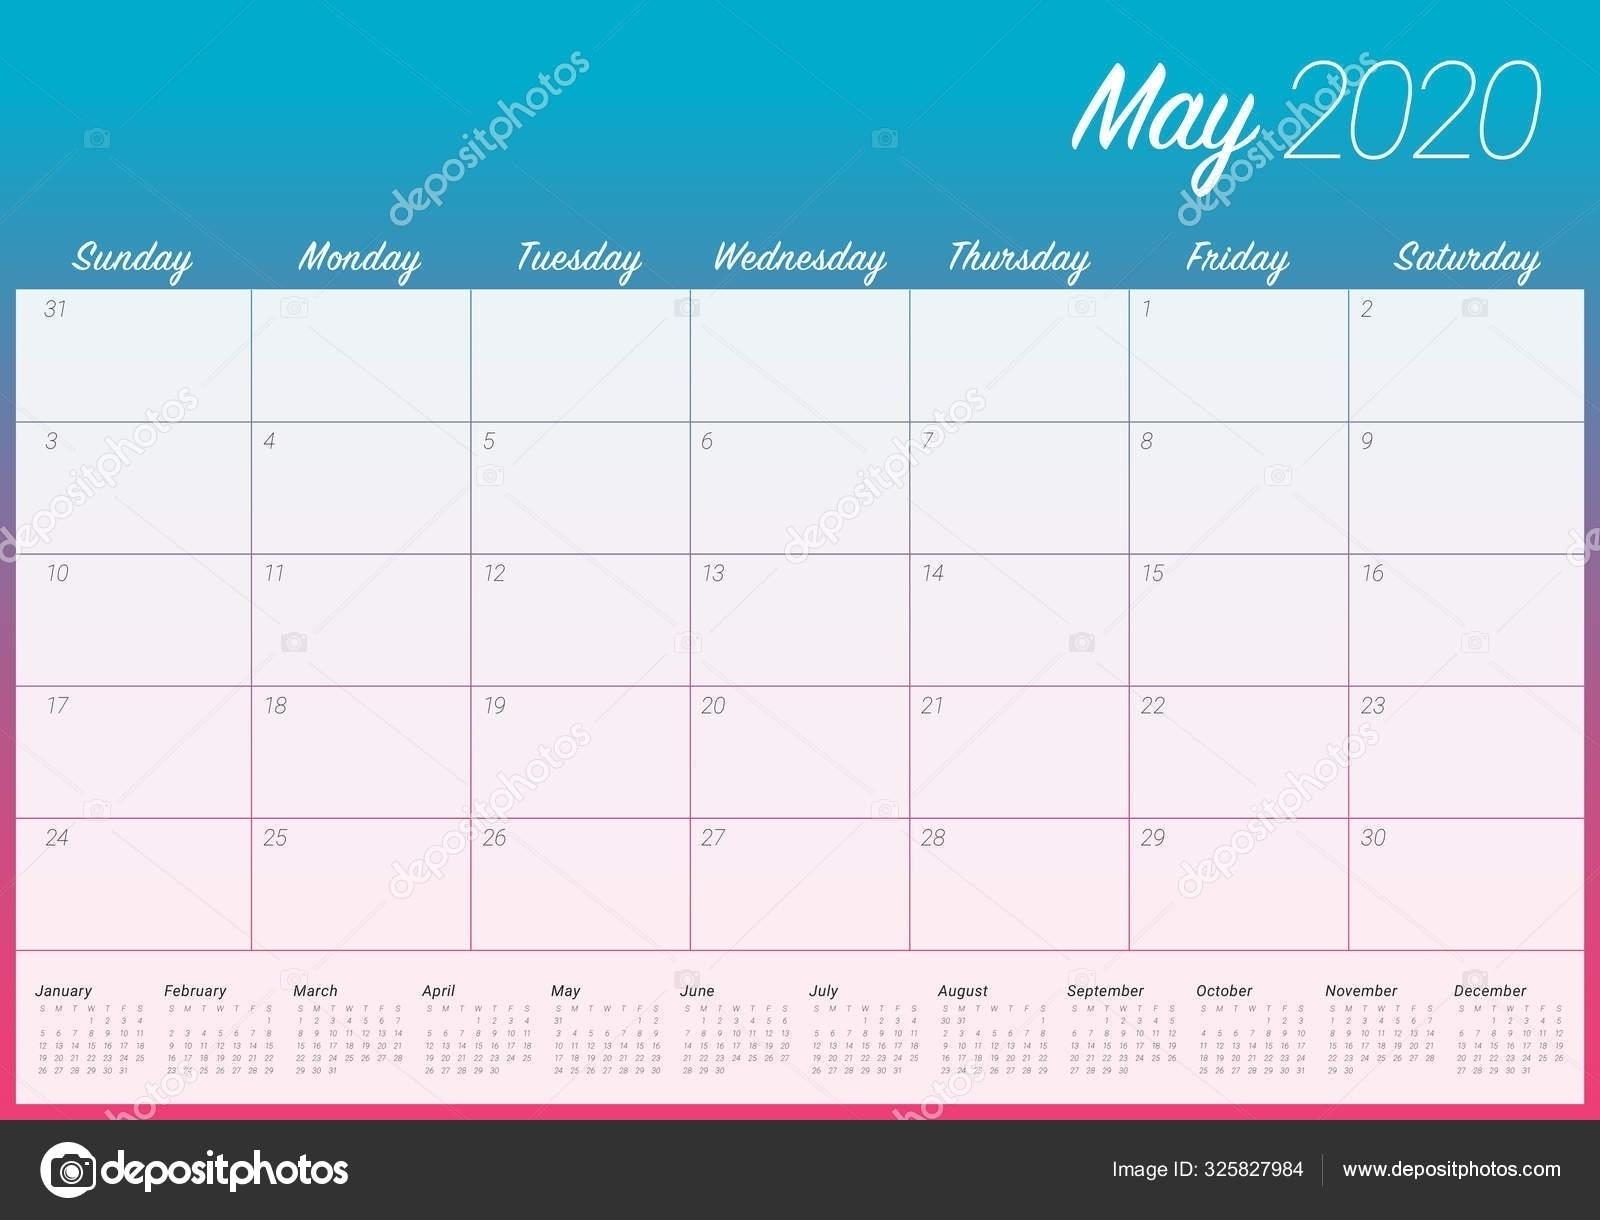 Depo 12 Week Calendar | Printable Calendar Template 2020